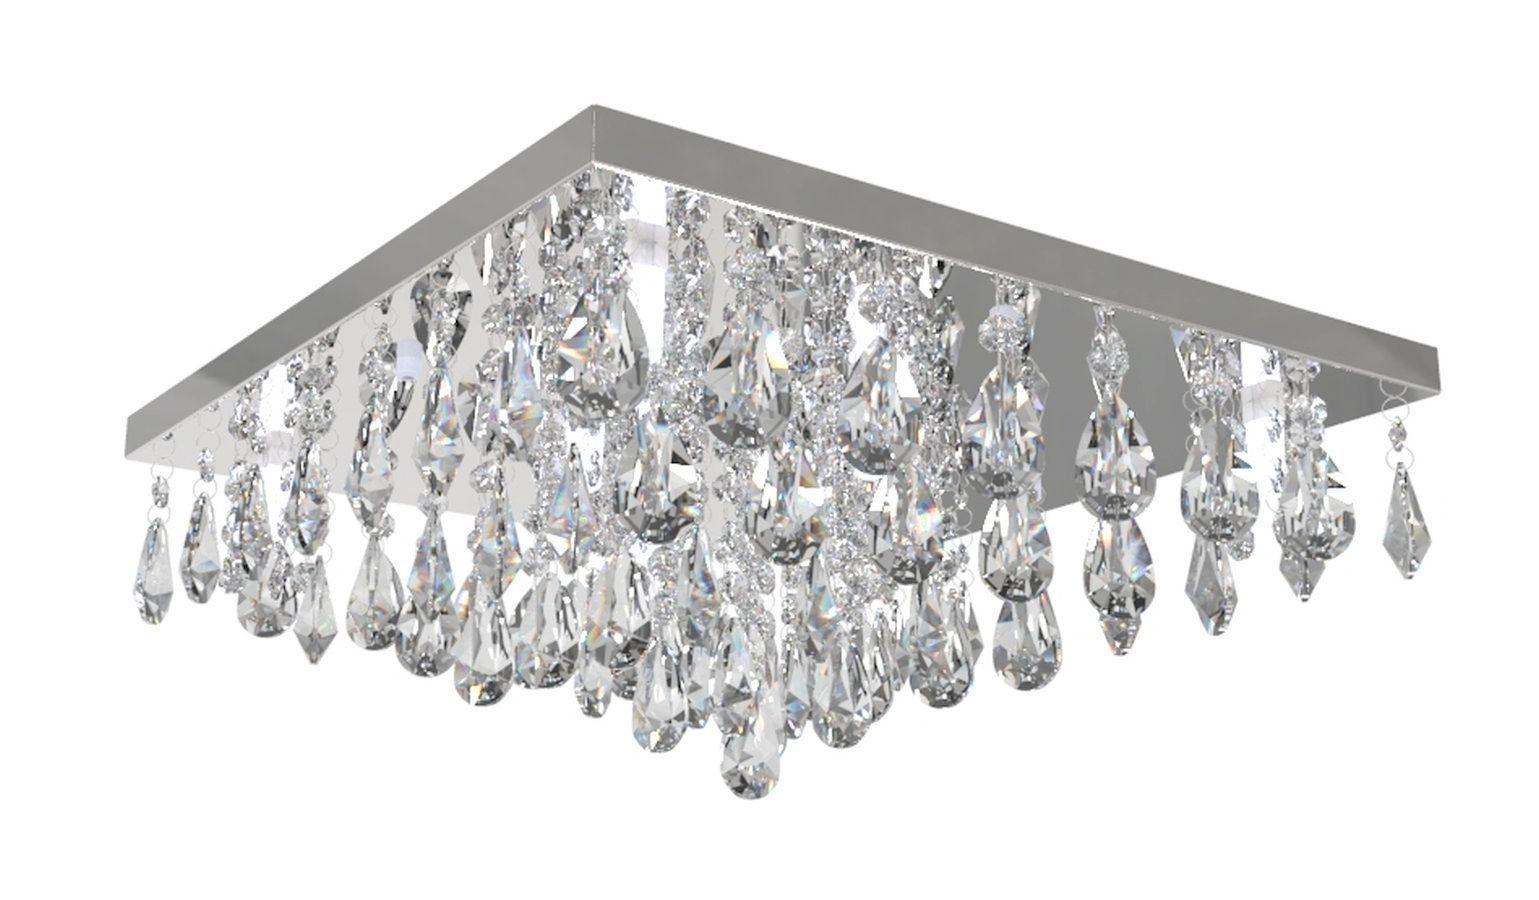 Plafon Lustre de Cristal Legitimo 42cm Sala de estar Mesa Jantar Quarto Living Ático